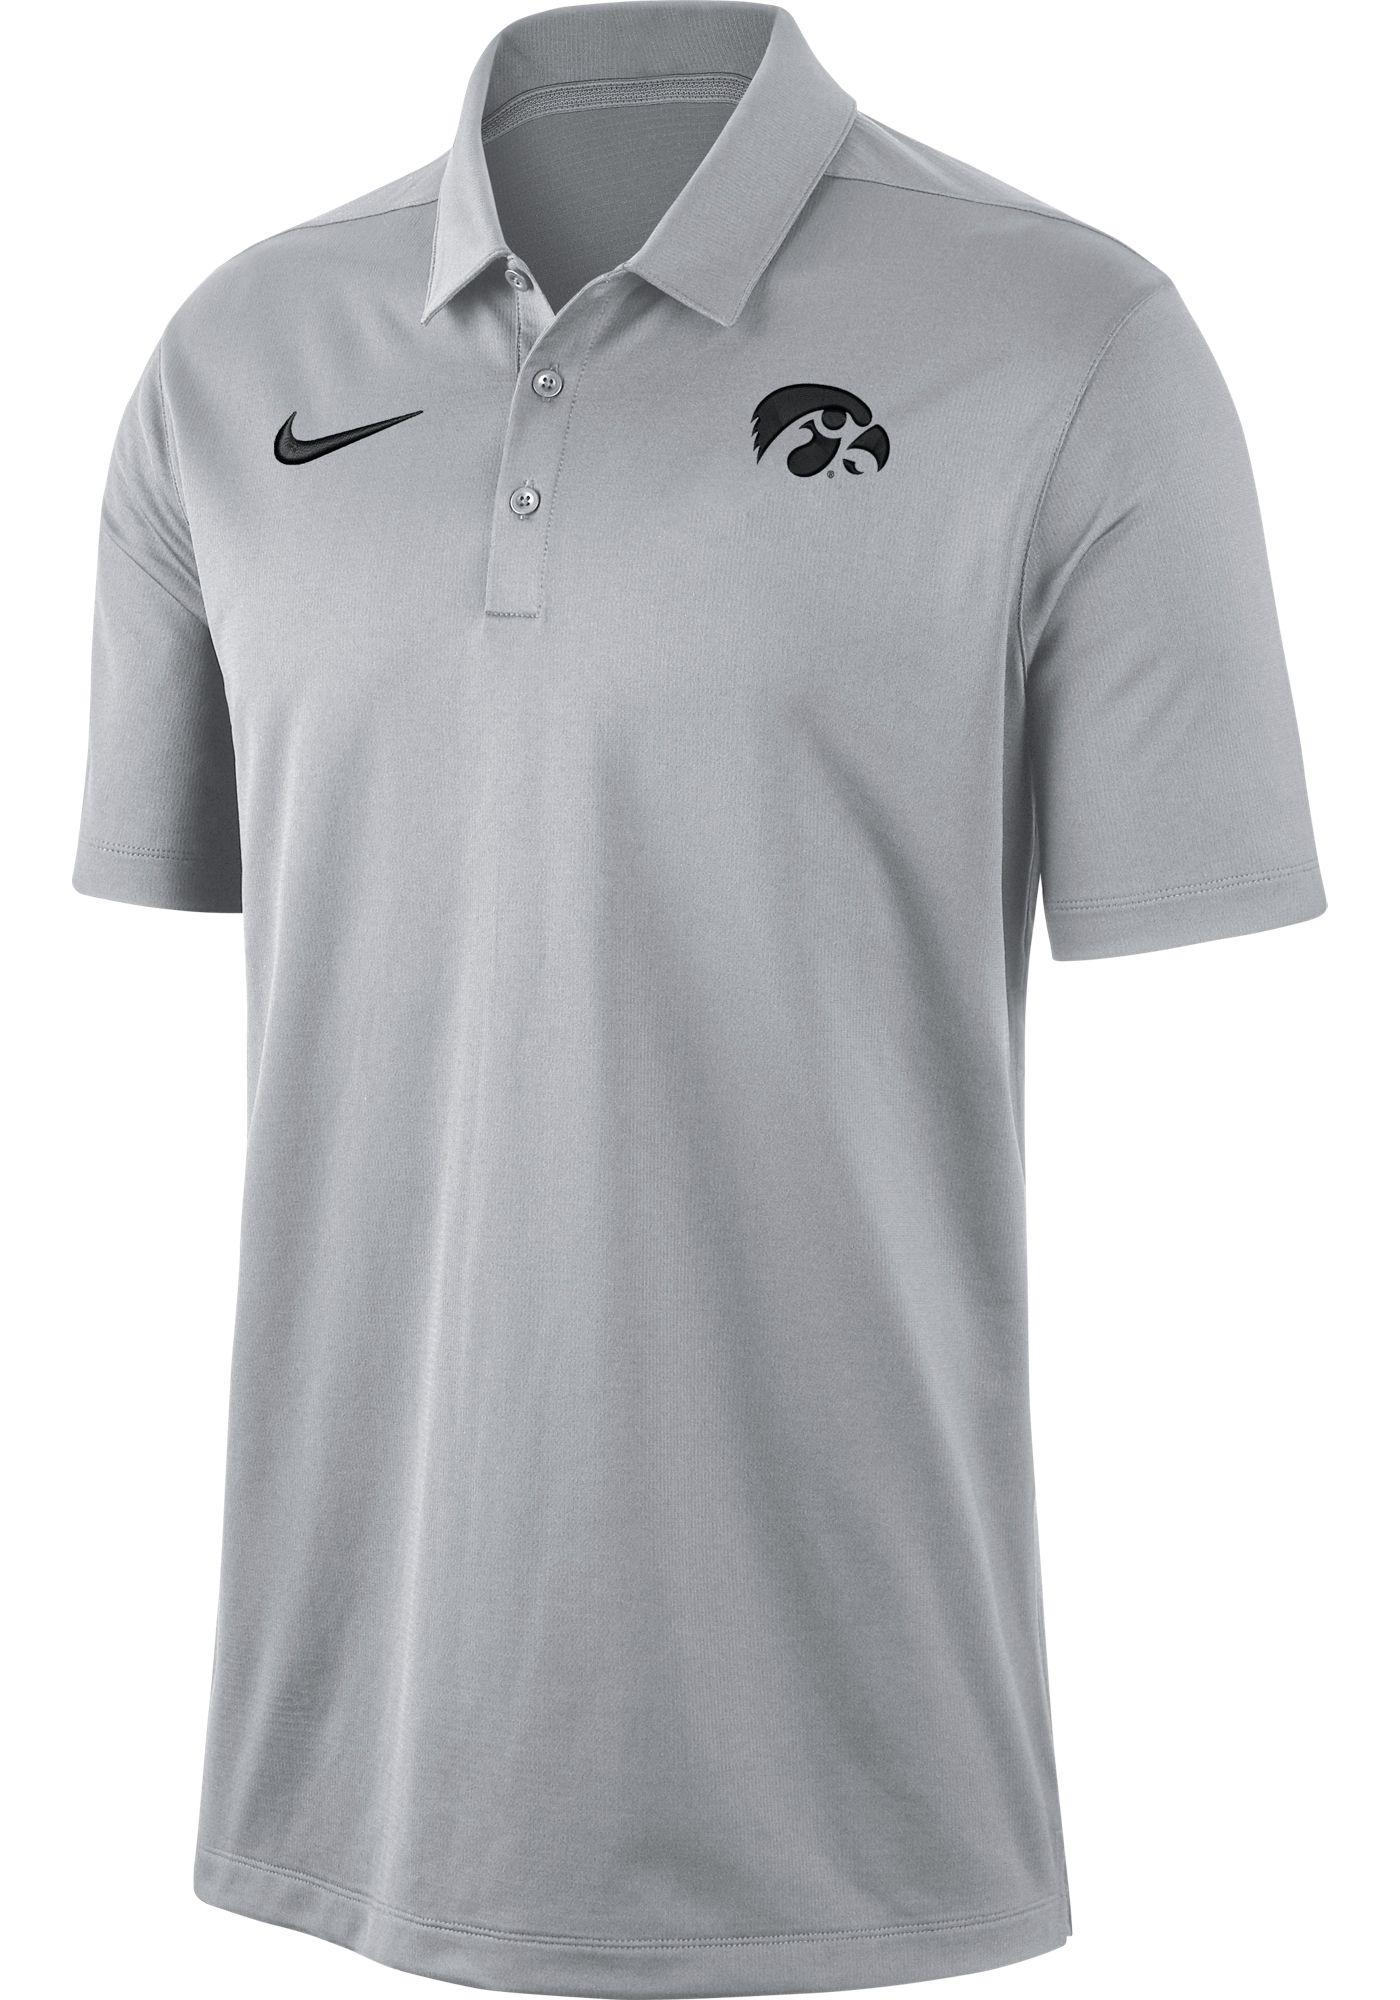 Nike Men's Iowa Hawkeyes Grey Dri-FIT Franchise Polo